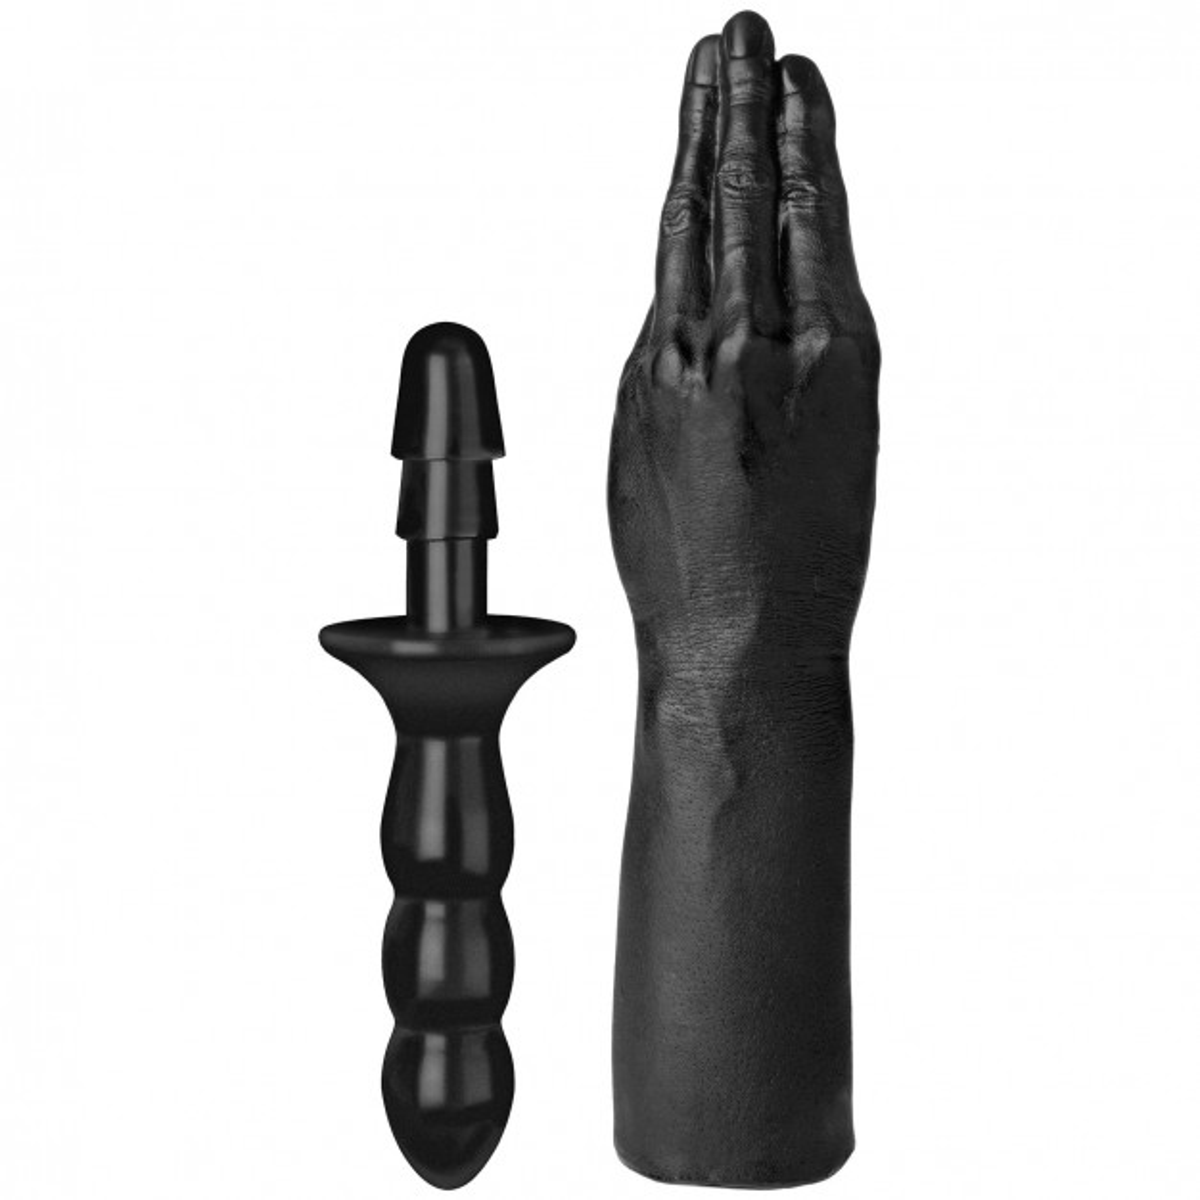 TitanMen The Hand with Vac-U-Lock Compatible Handle